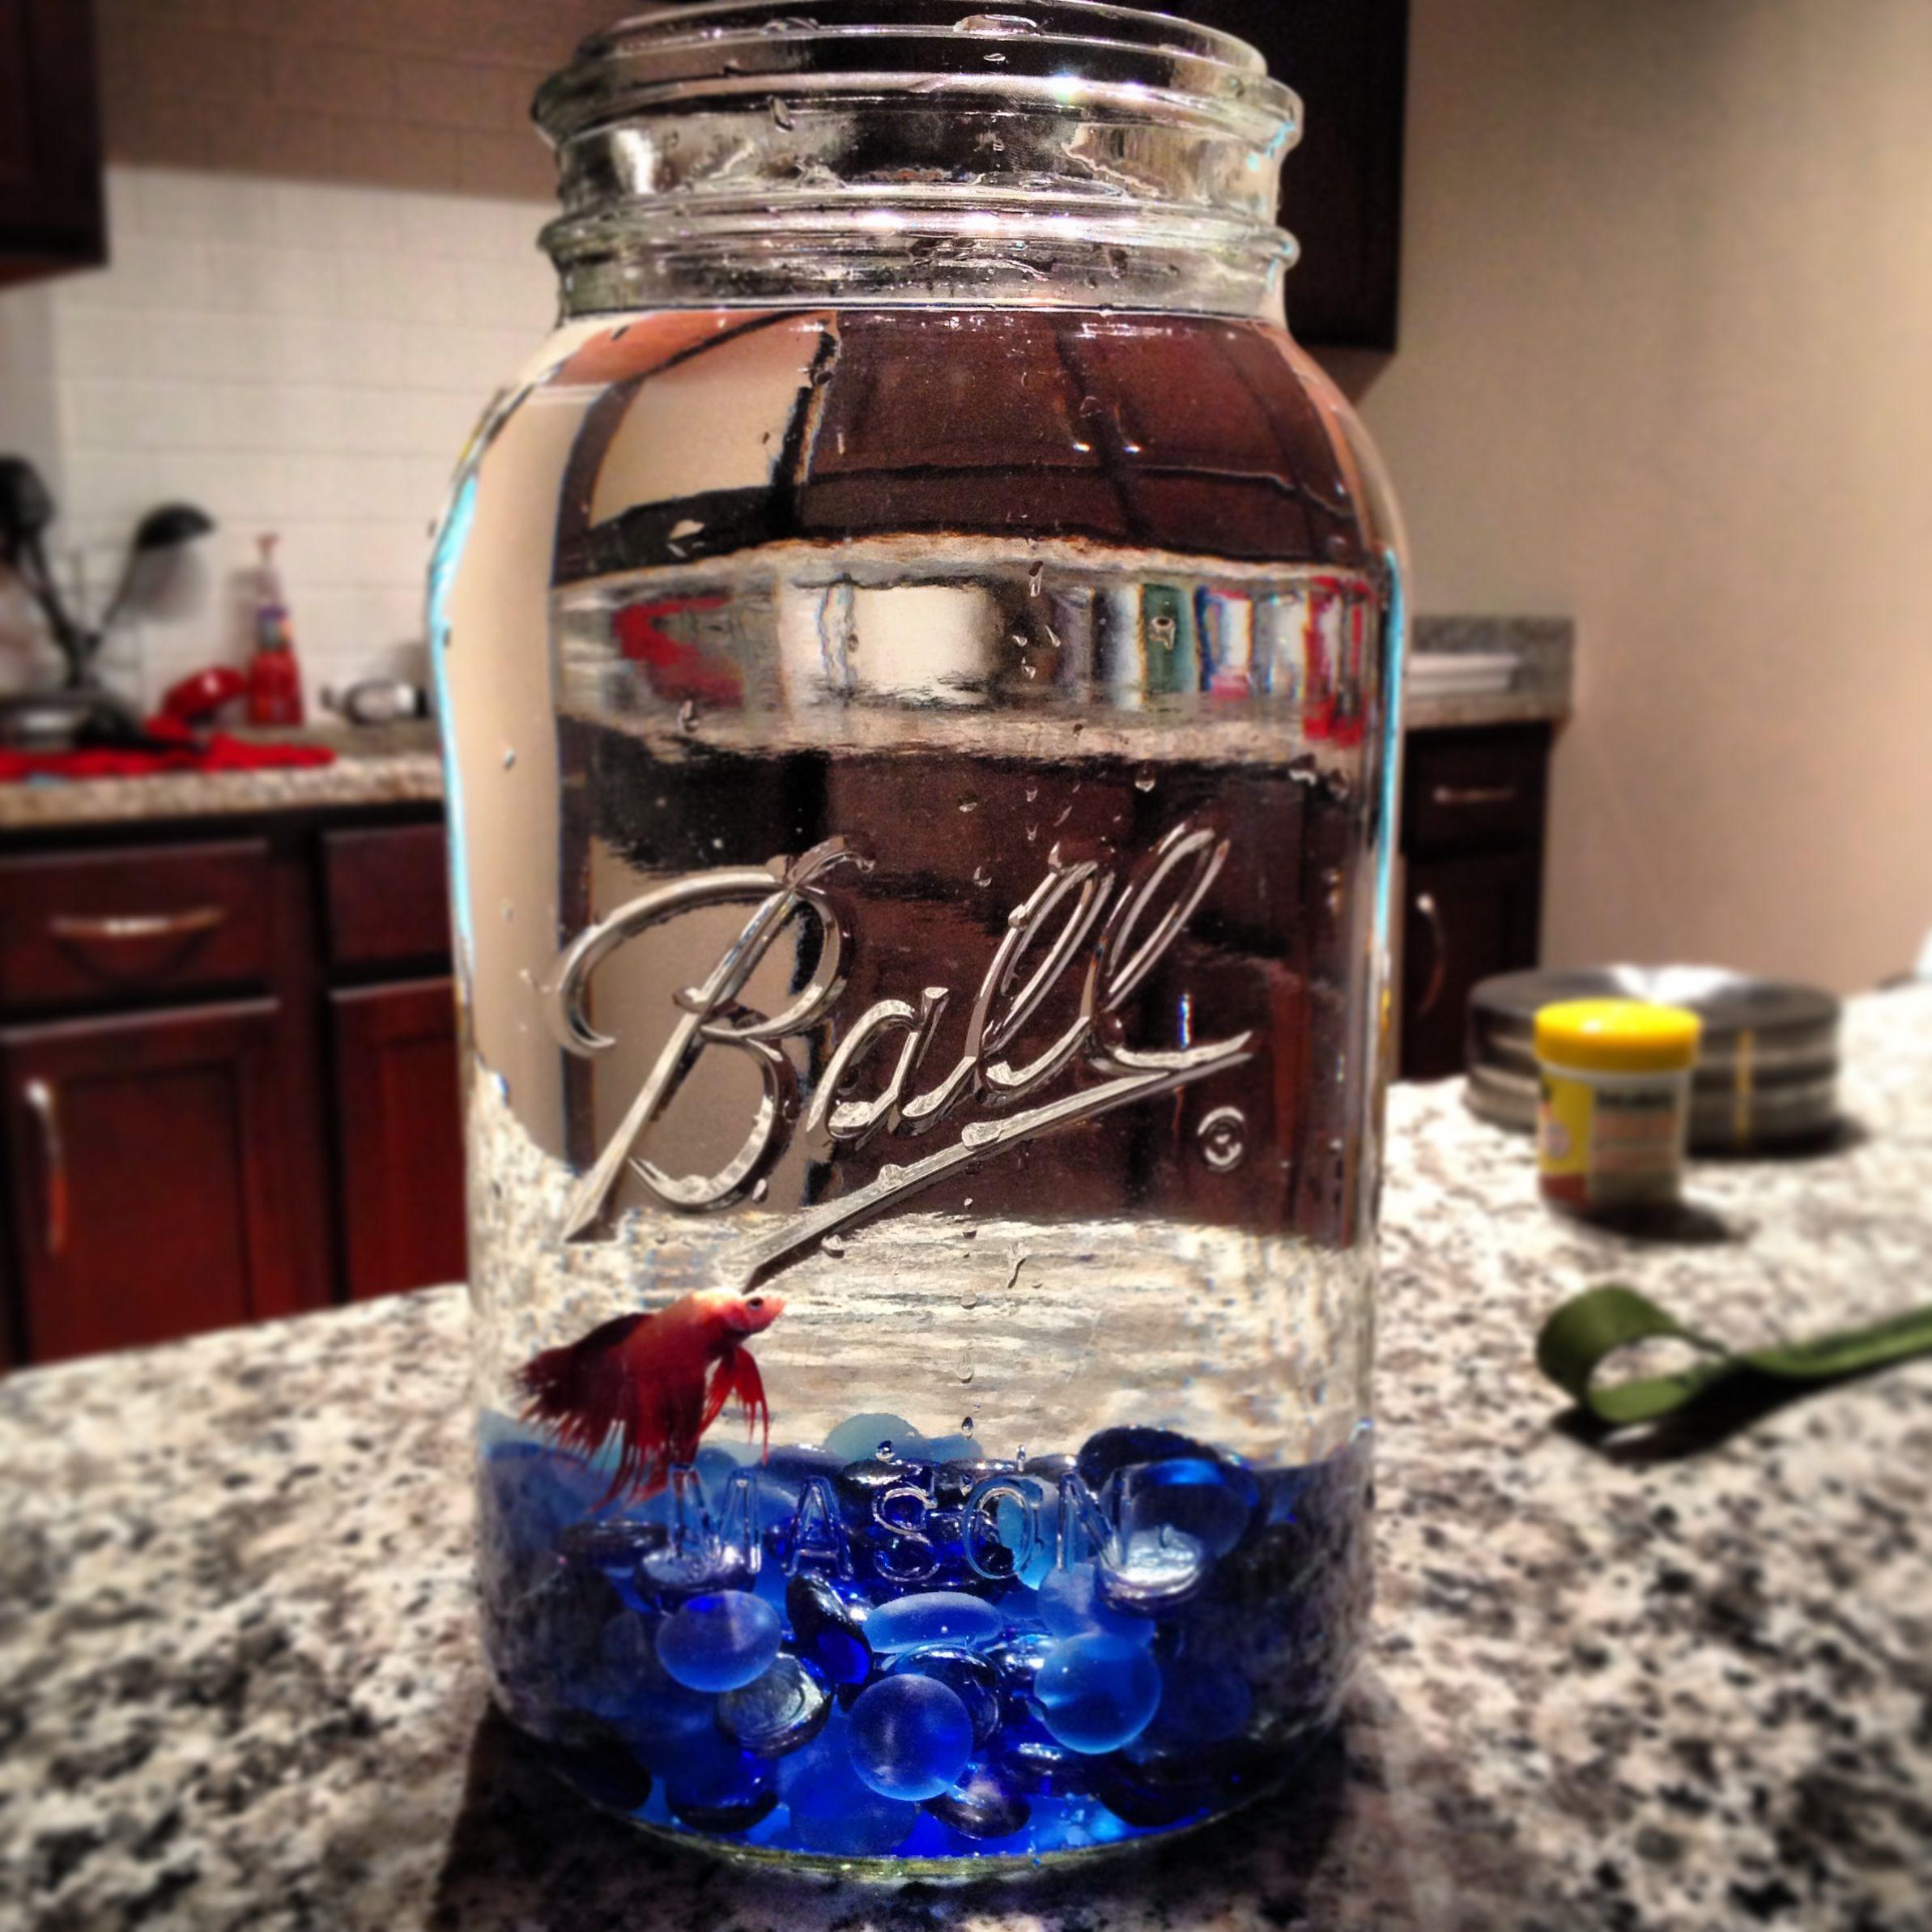 Beta fish in his mason jar betta fish pinterest beta for Fish in a jar